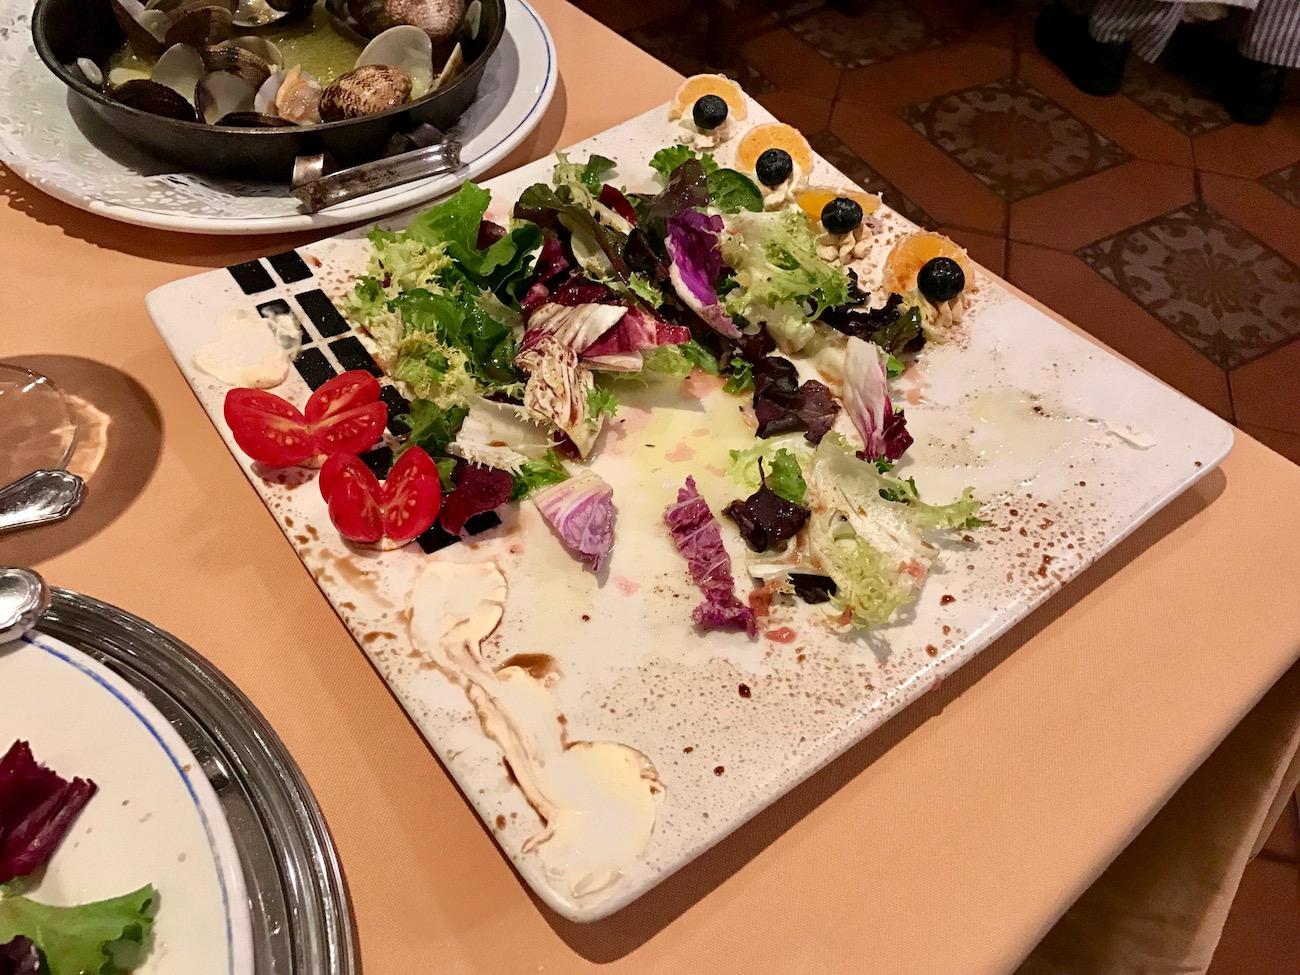 It was a beautiful salad...